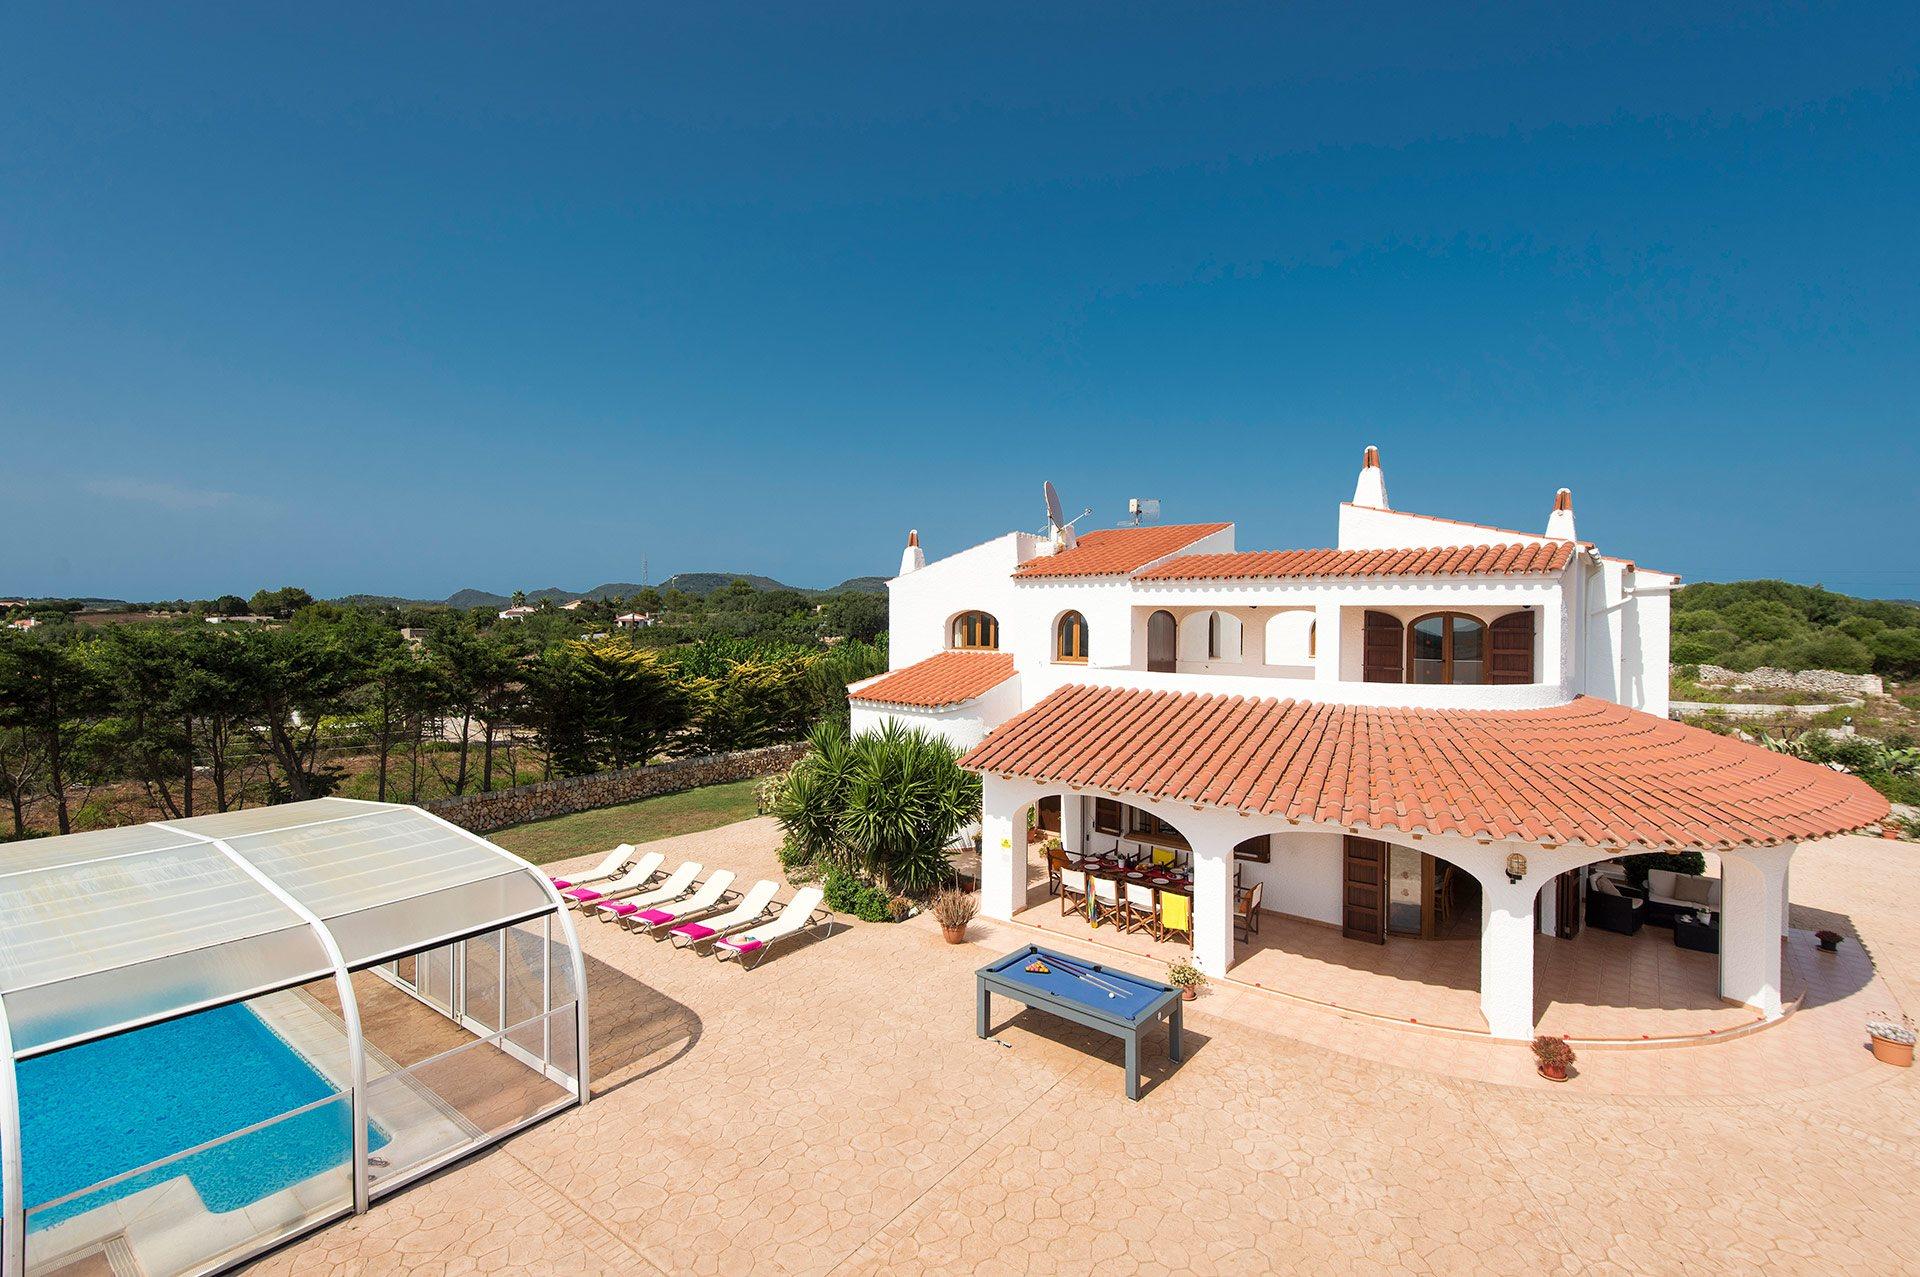 Villa Renate, Cala Galdana, Menorca, Spain